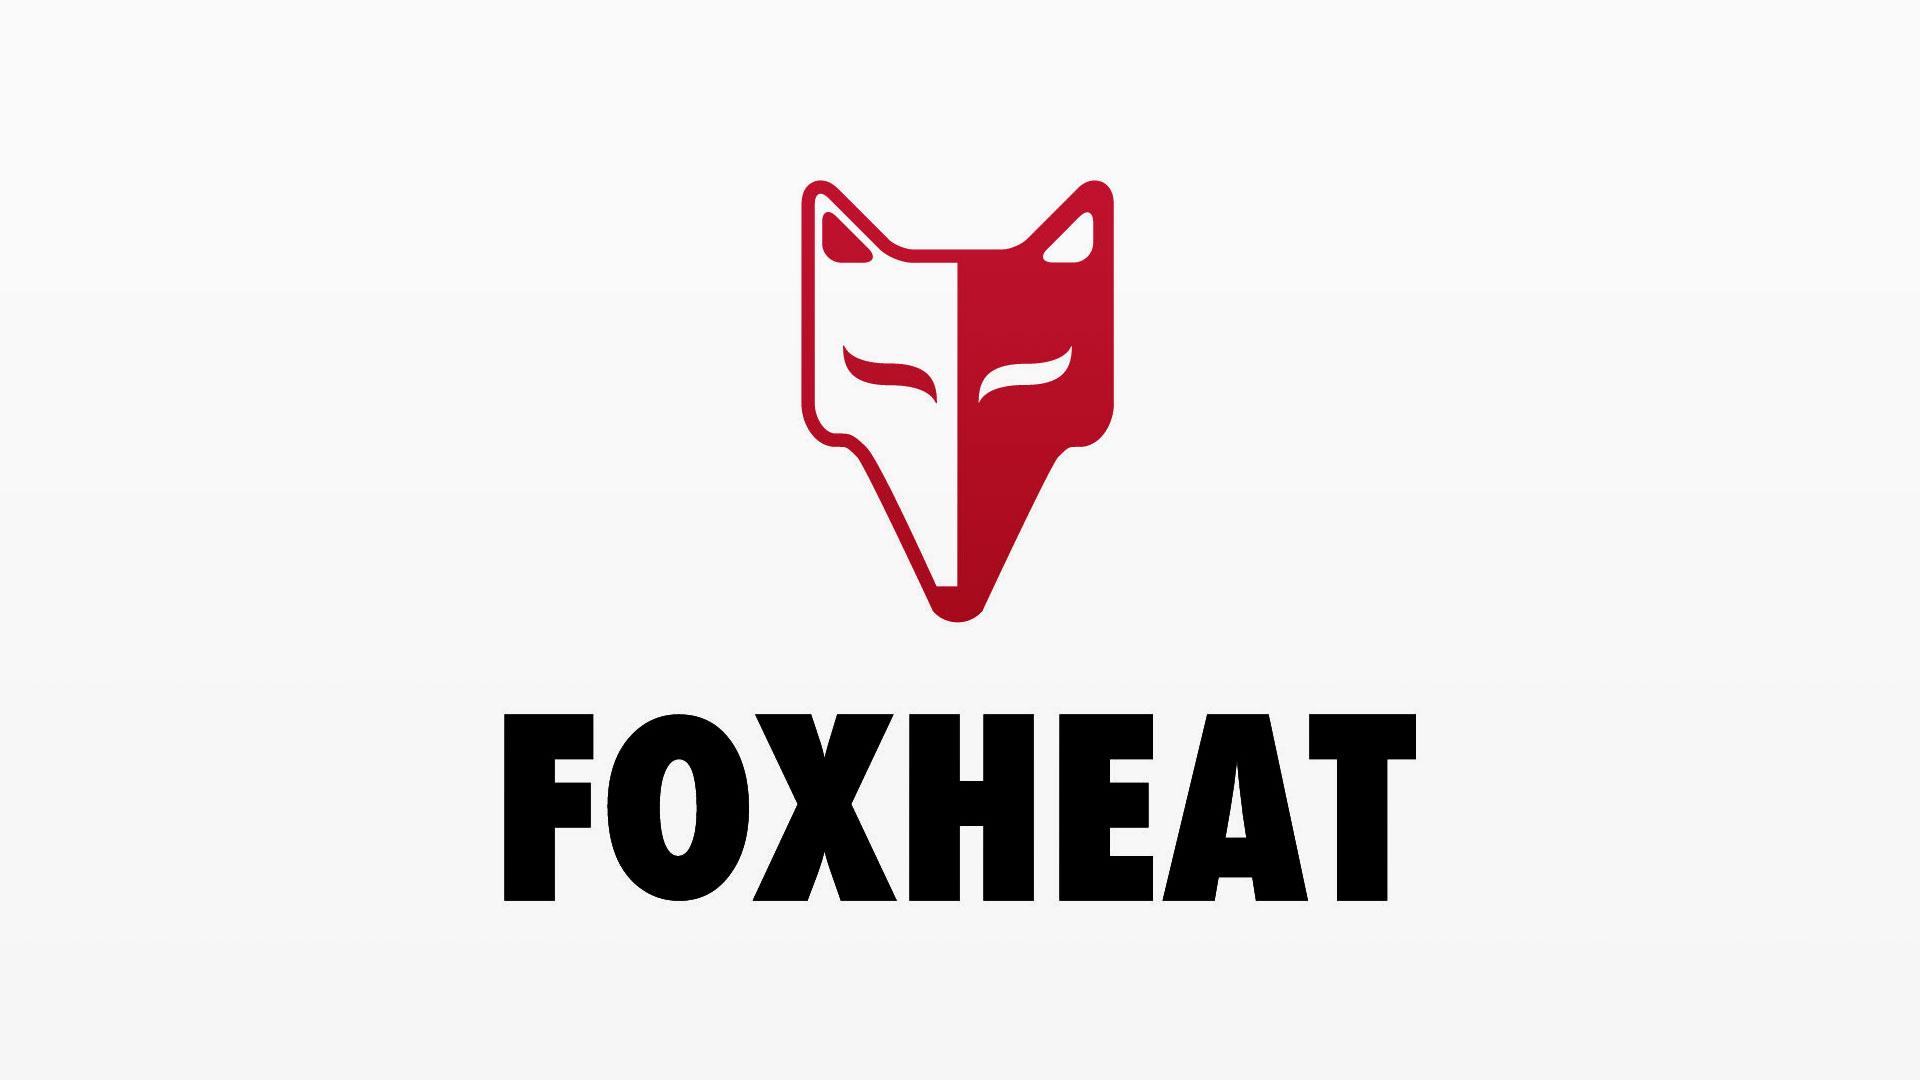 Foxheat-Vert-1920x1080.jpg